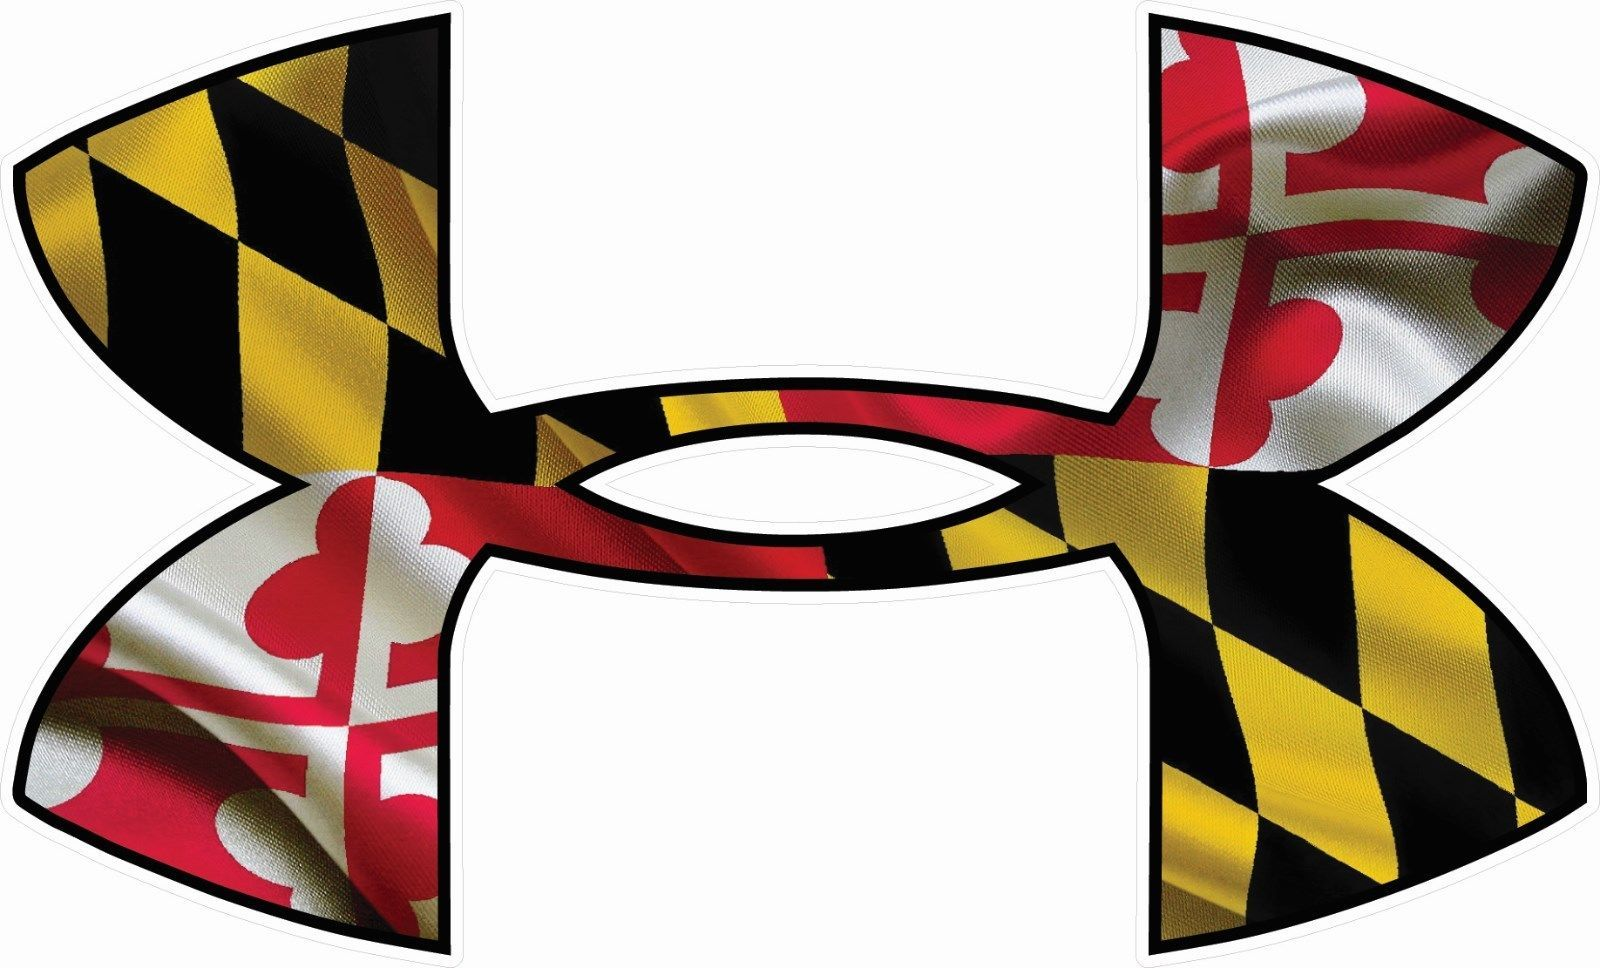 Under Armour Maryland Car Window Decals Car Decals Car